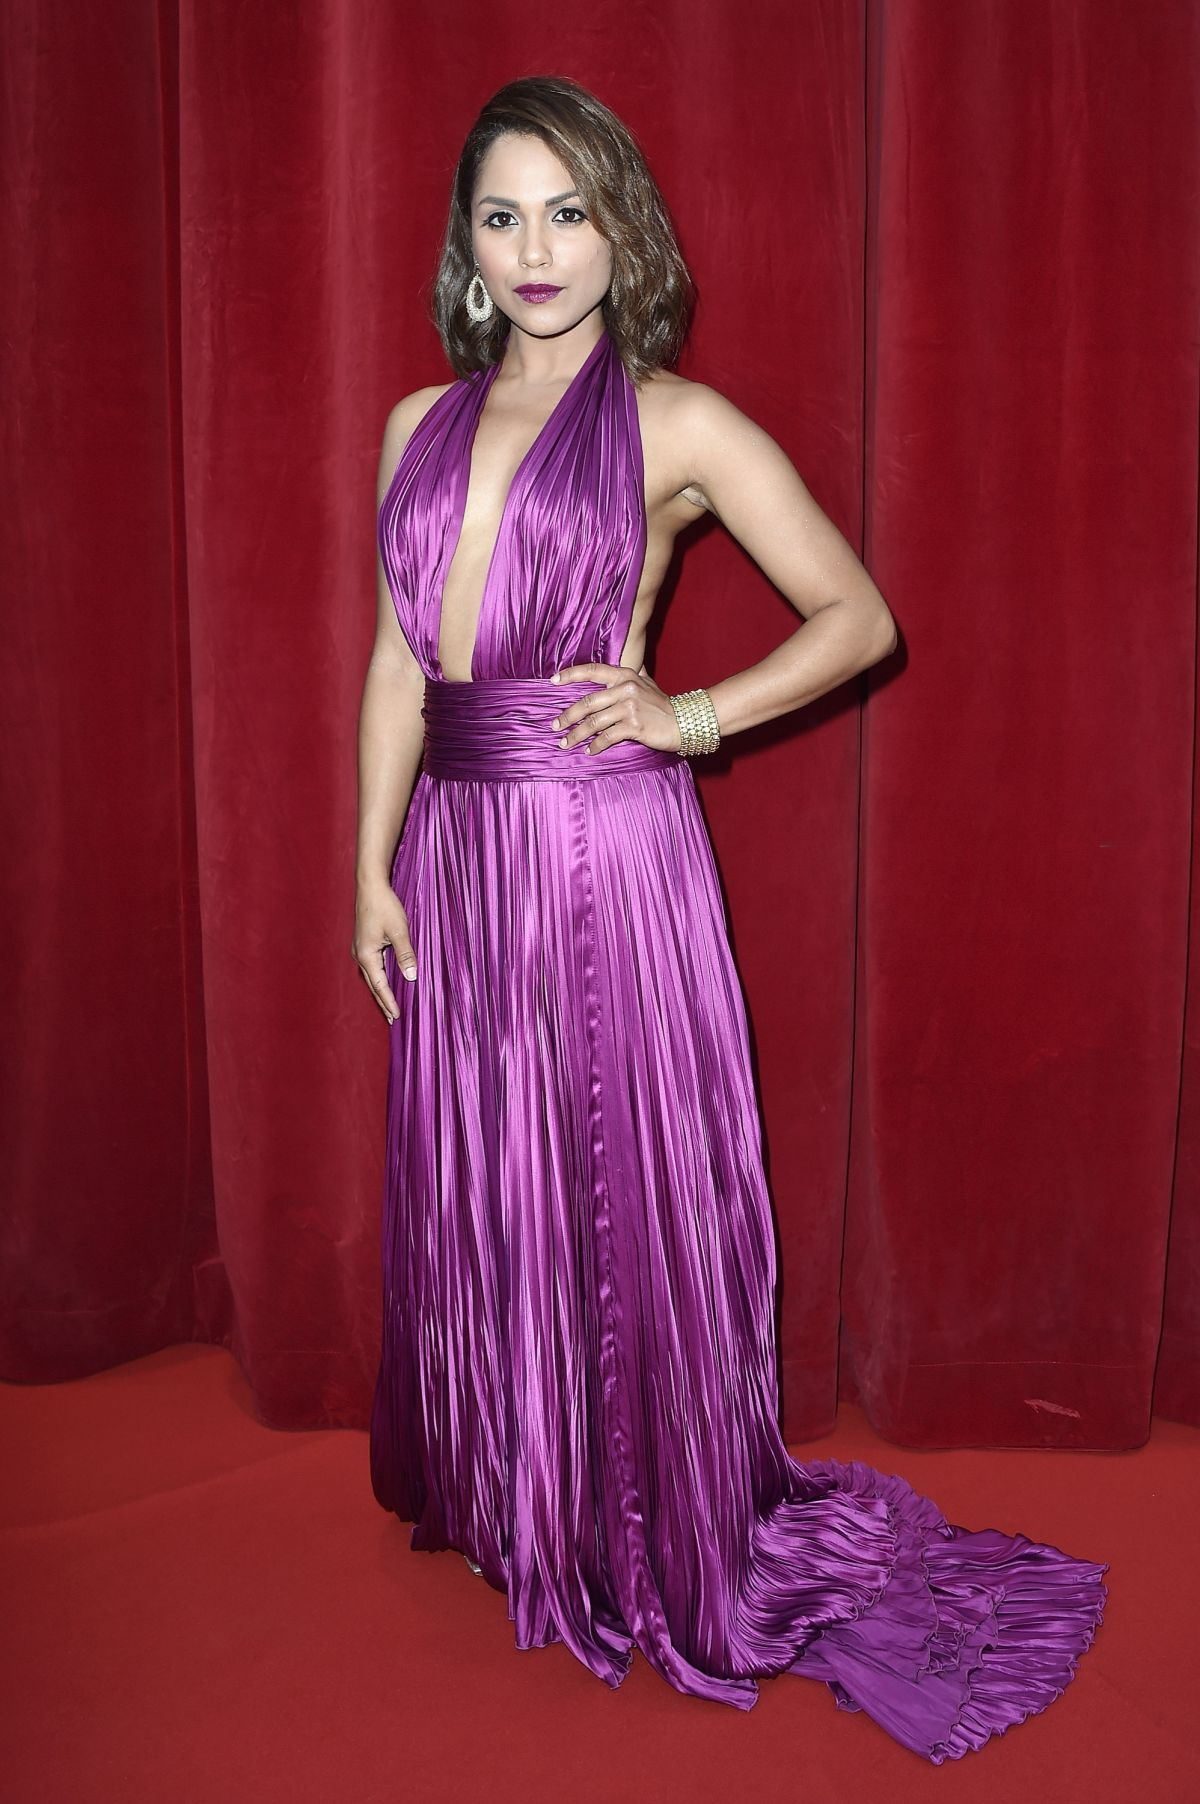 MONICA RAYMUND at 2014 Monte Carlo TV Festival Closing Ceremony